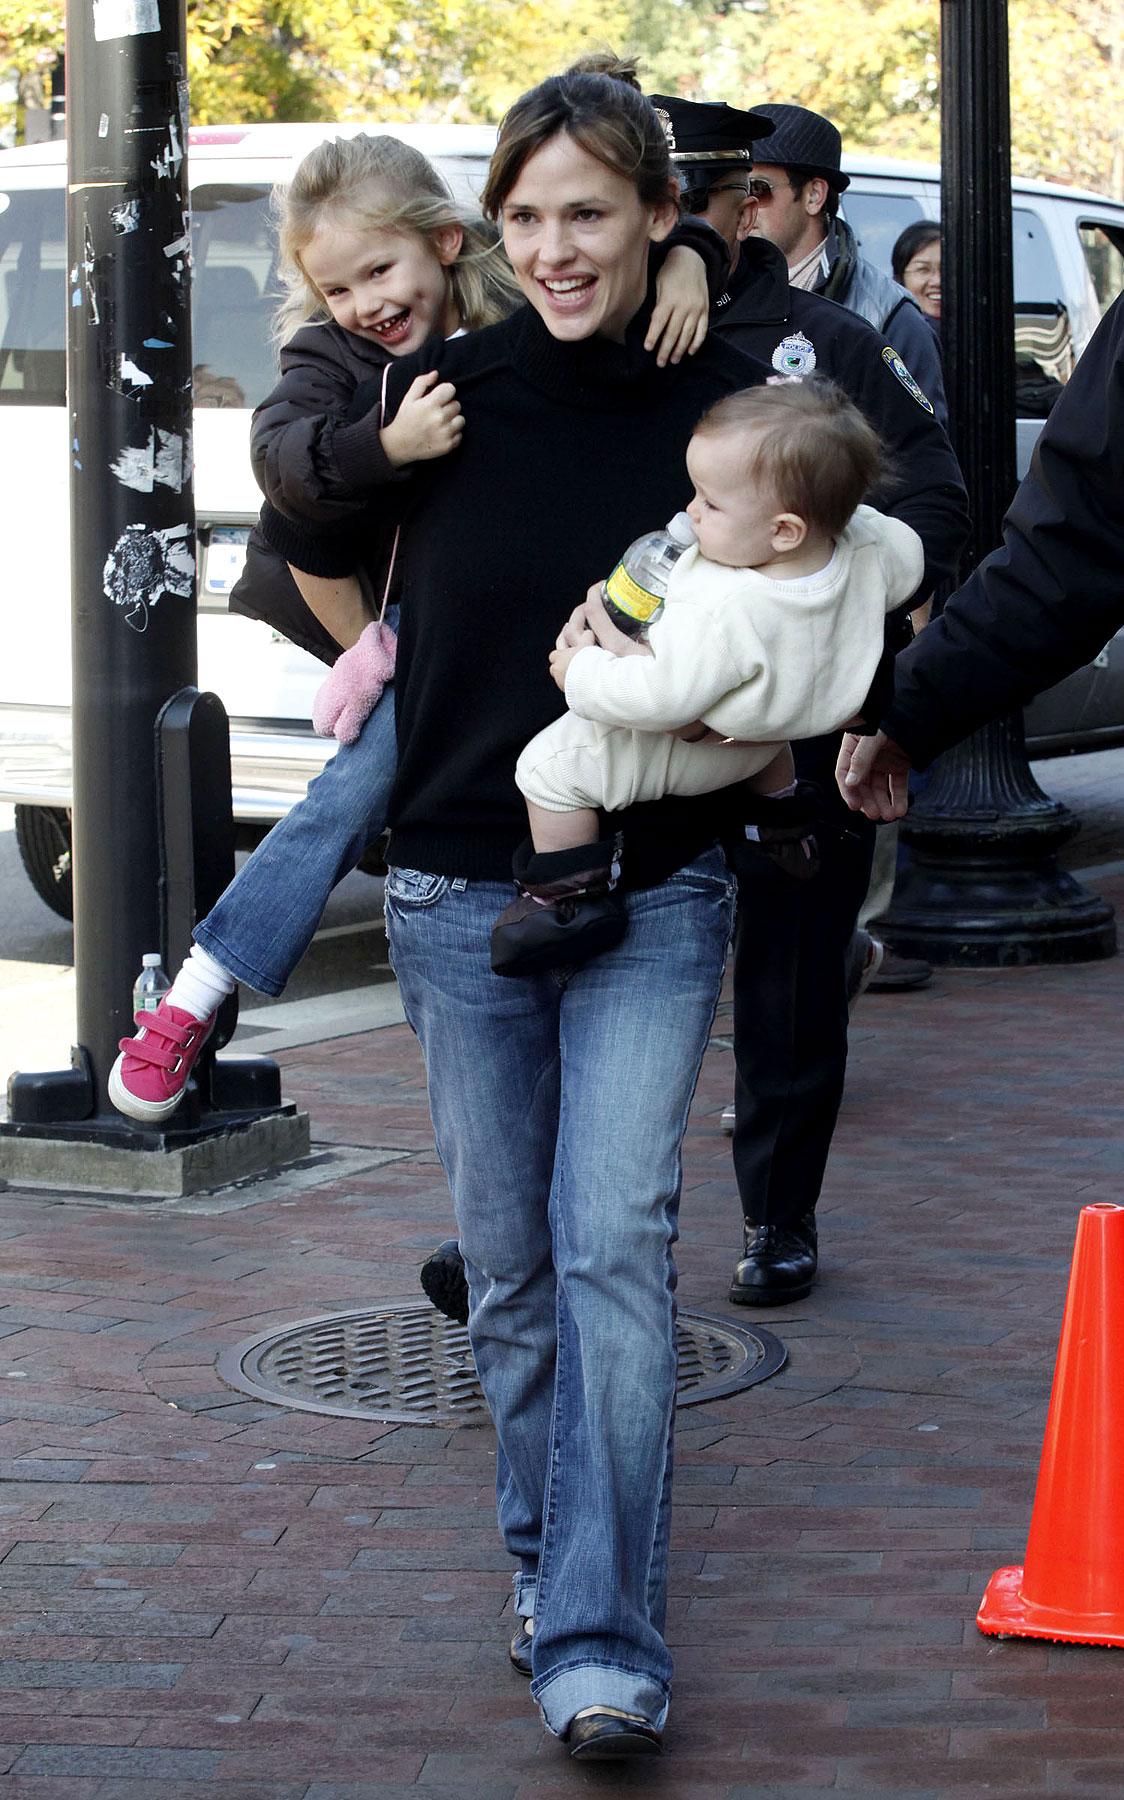 PHOTO GALLERY: Jennifer Garner is Super Mom